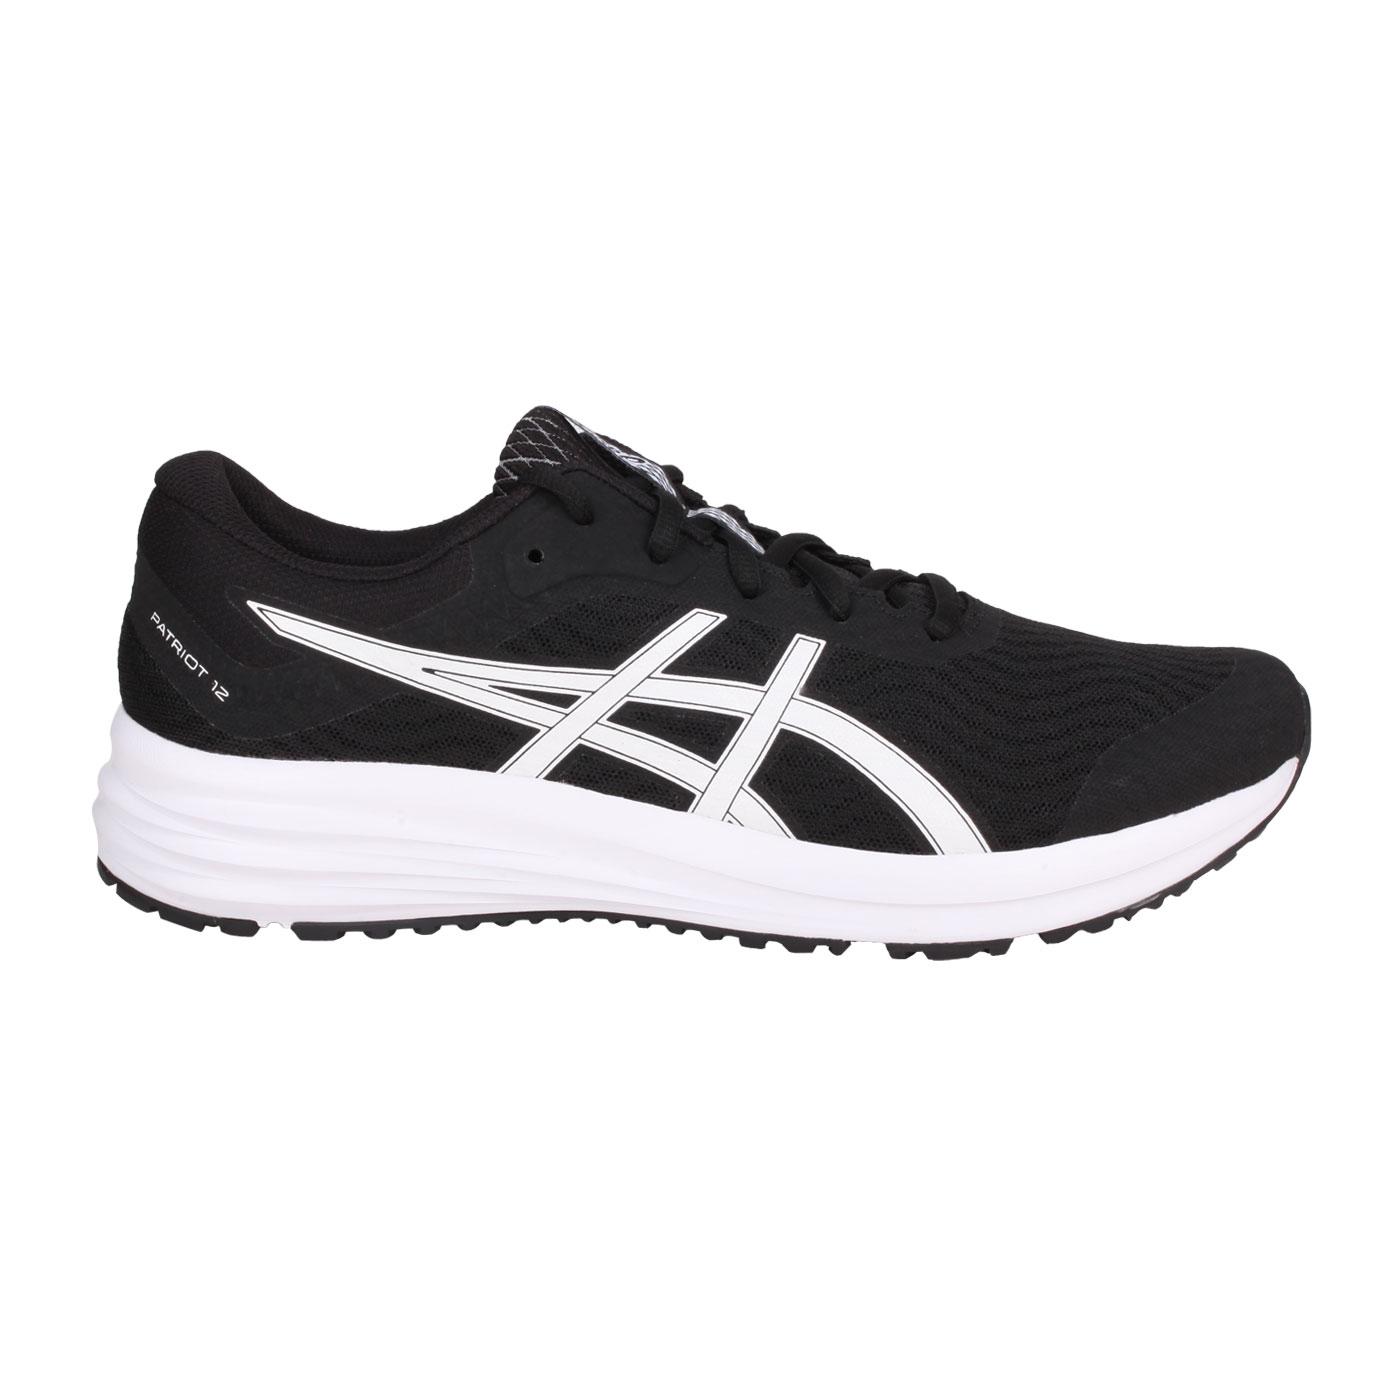 ASICS 男款慢跑鞋  @PATRIOT 12@1011A823-001 - 黑白